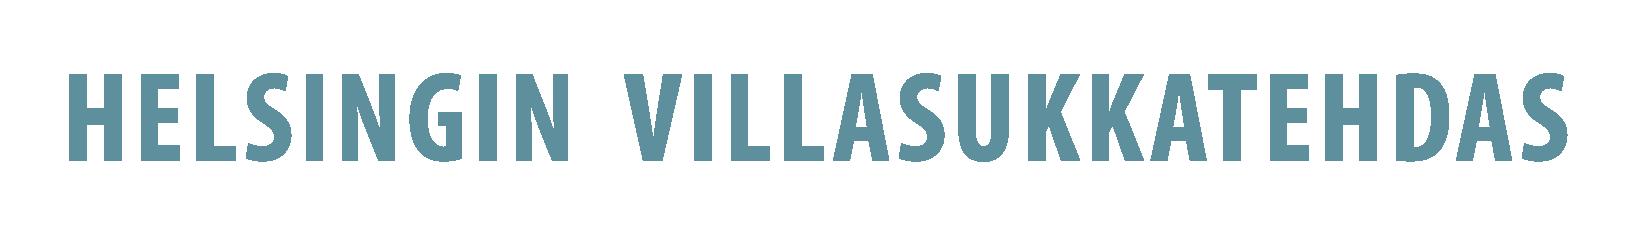 HVS-logo2_sin